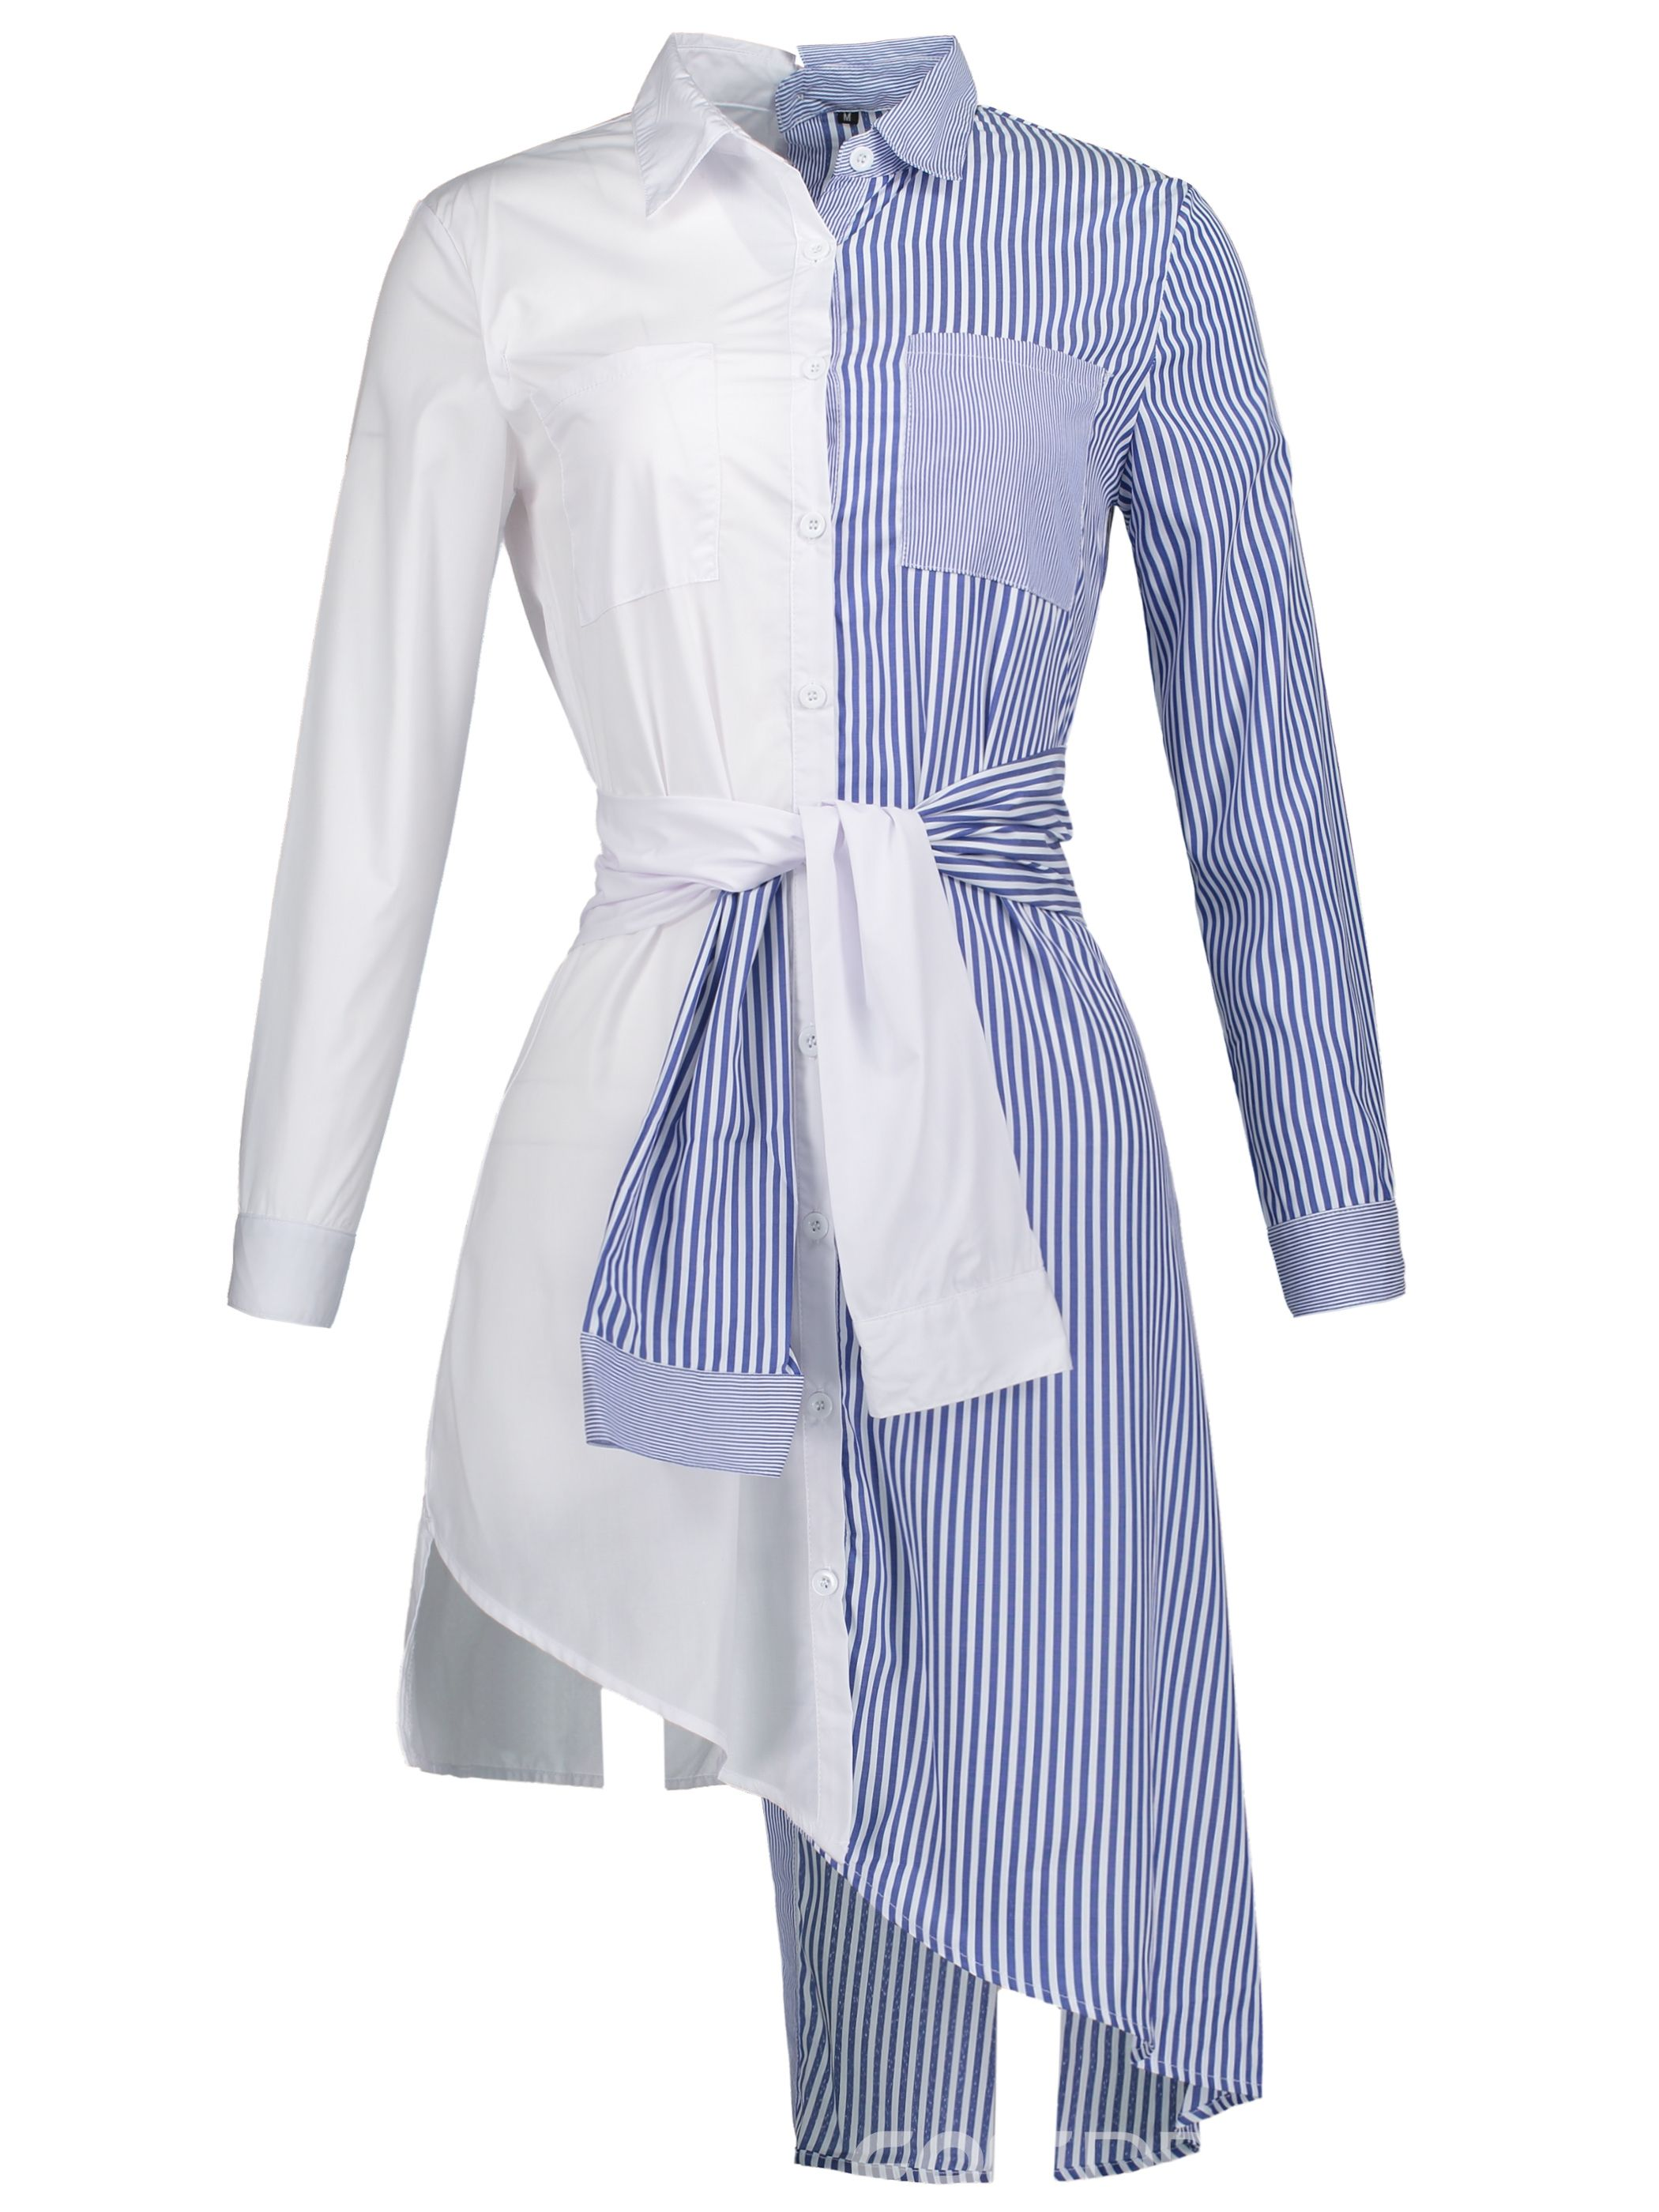 Ericdress Stripe Mid-Length Patchwork Shirt | Ladies Tops in 2019 ...